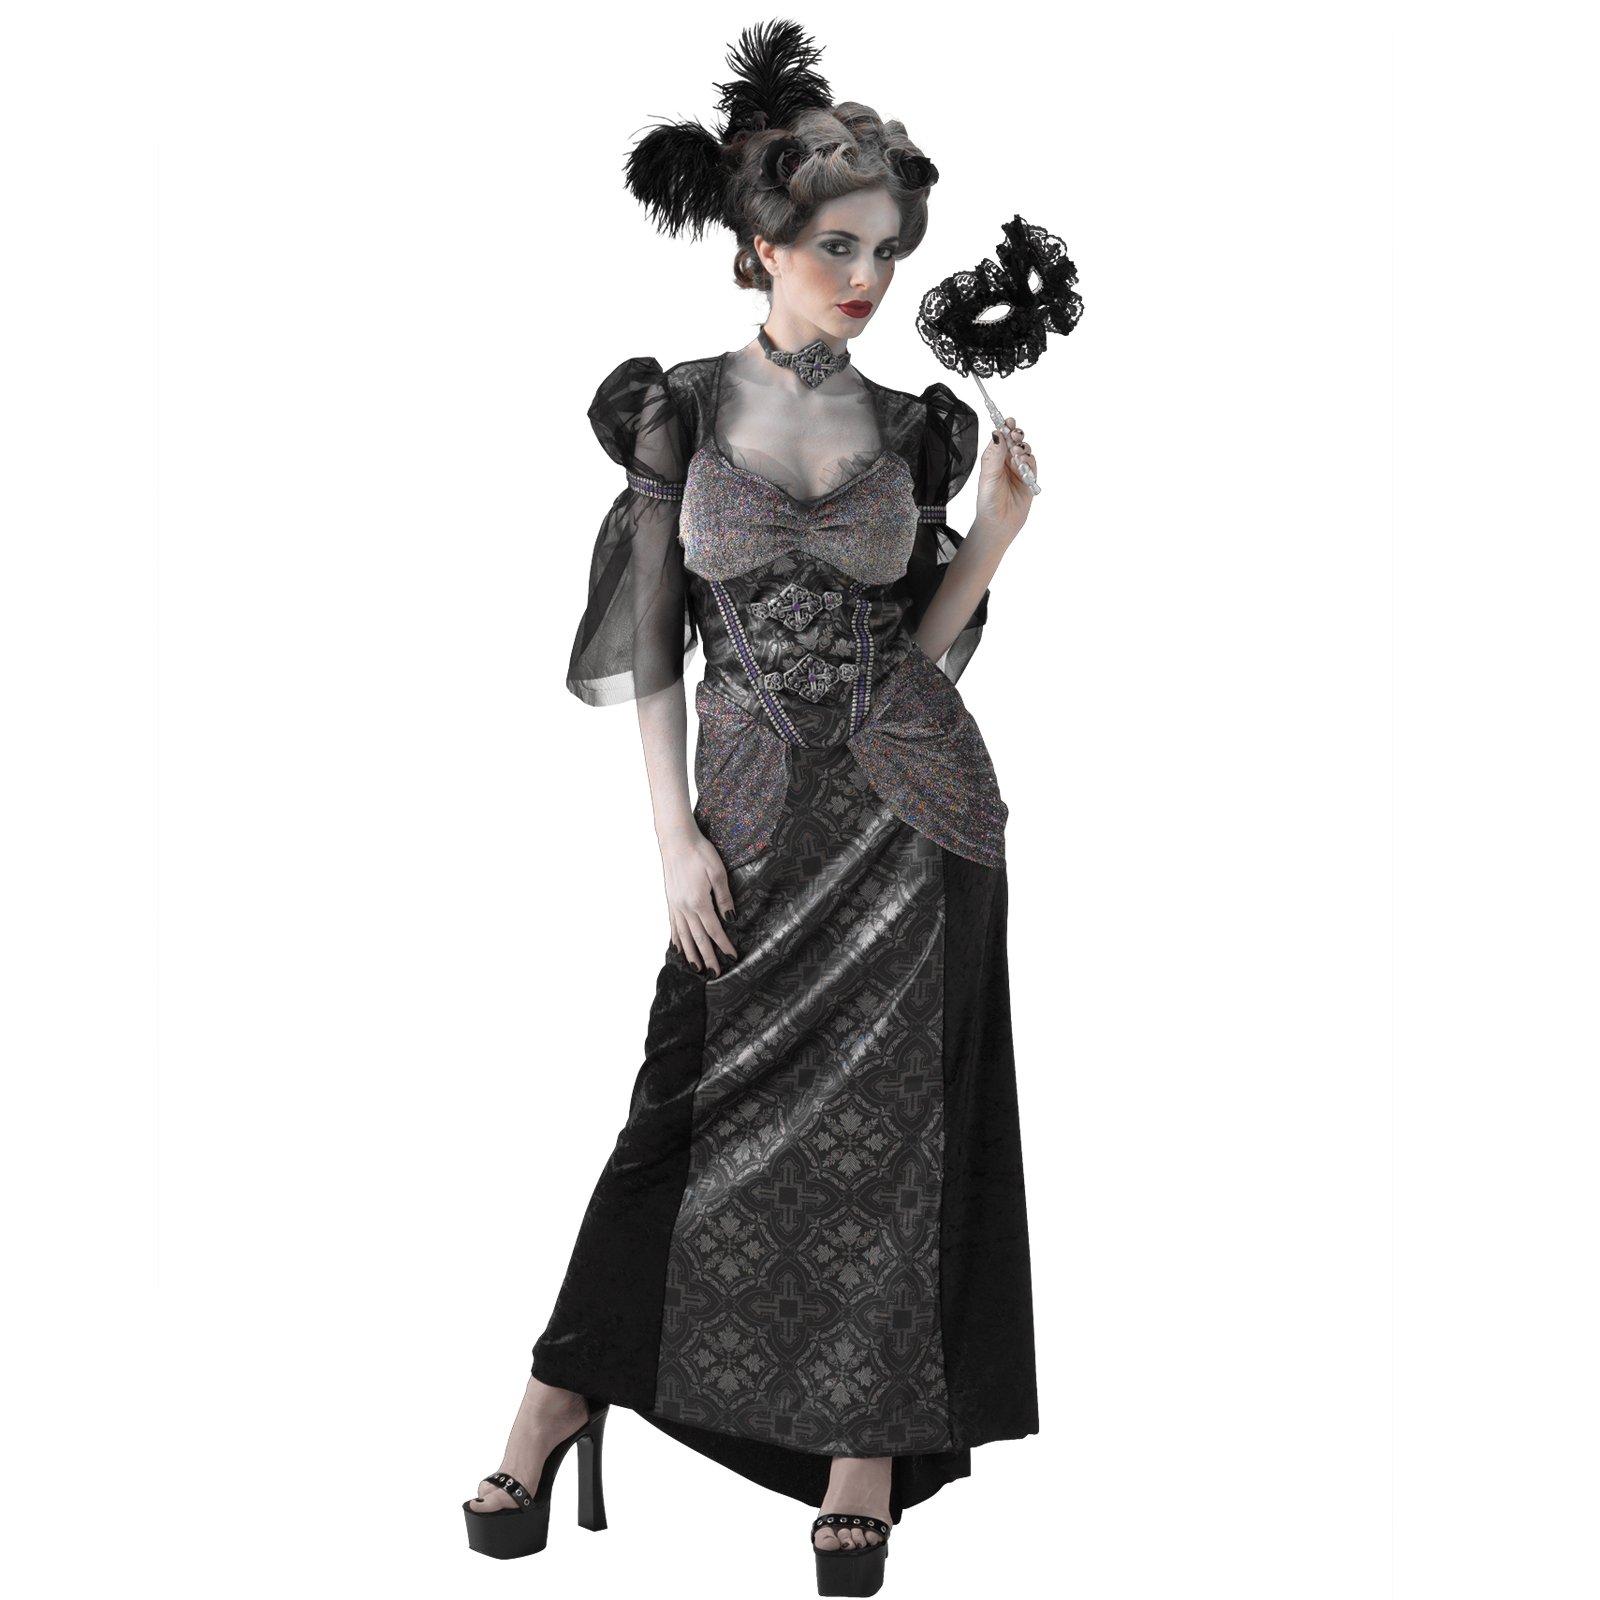 4329ec8c68b4a Masquerade Ball Couple Costumes & Image Is Loading Masquerade-ball ...